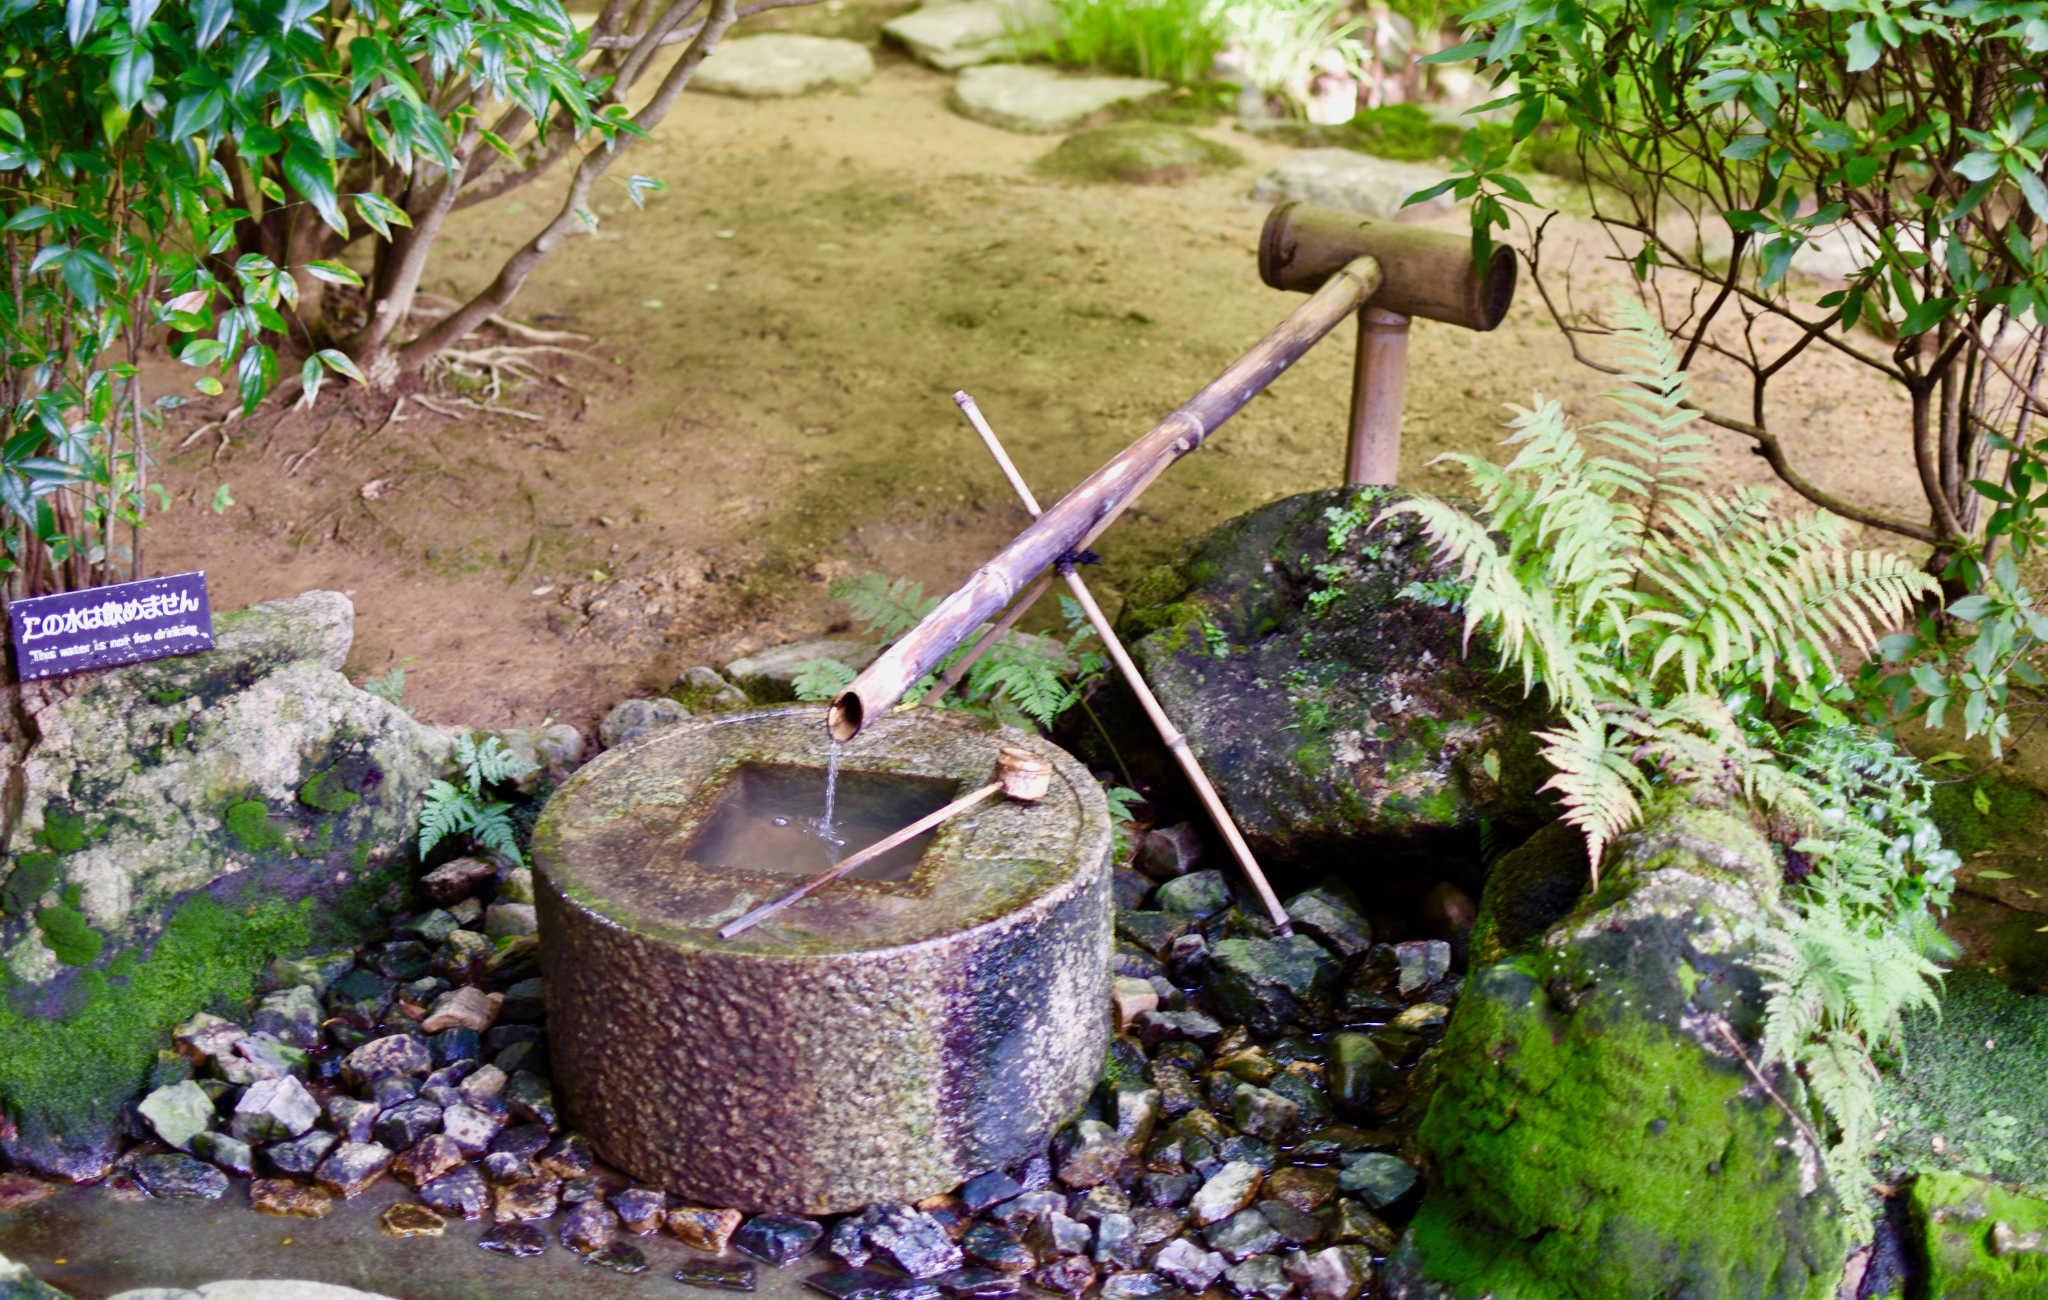 Tsukabai derrière le jardin ryoan-ji